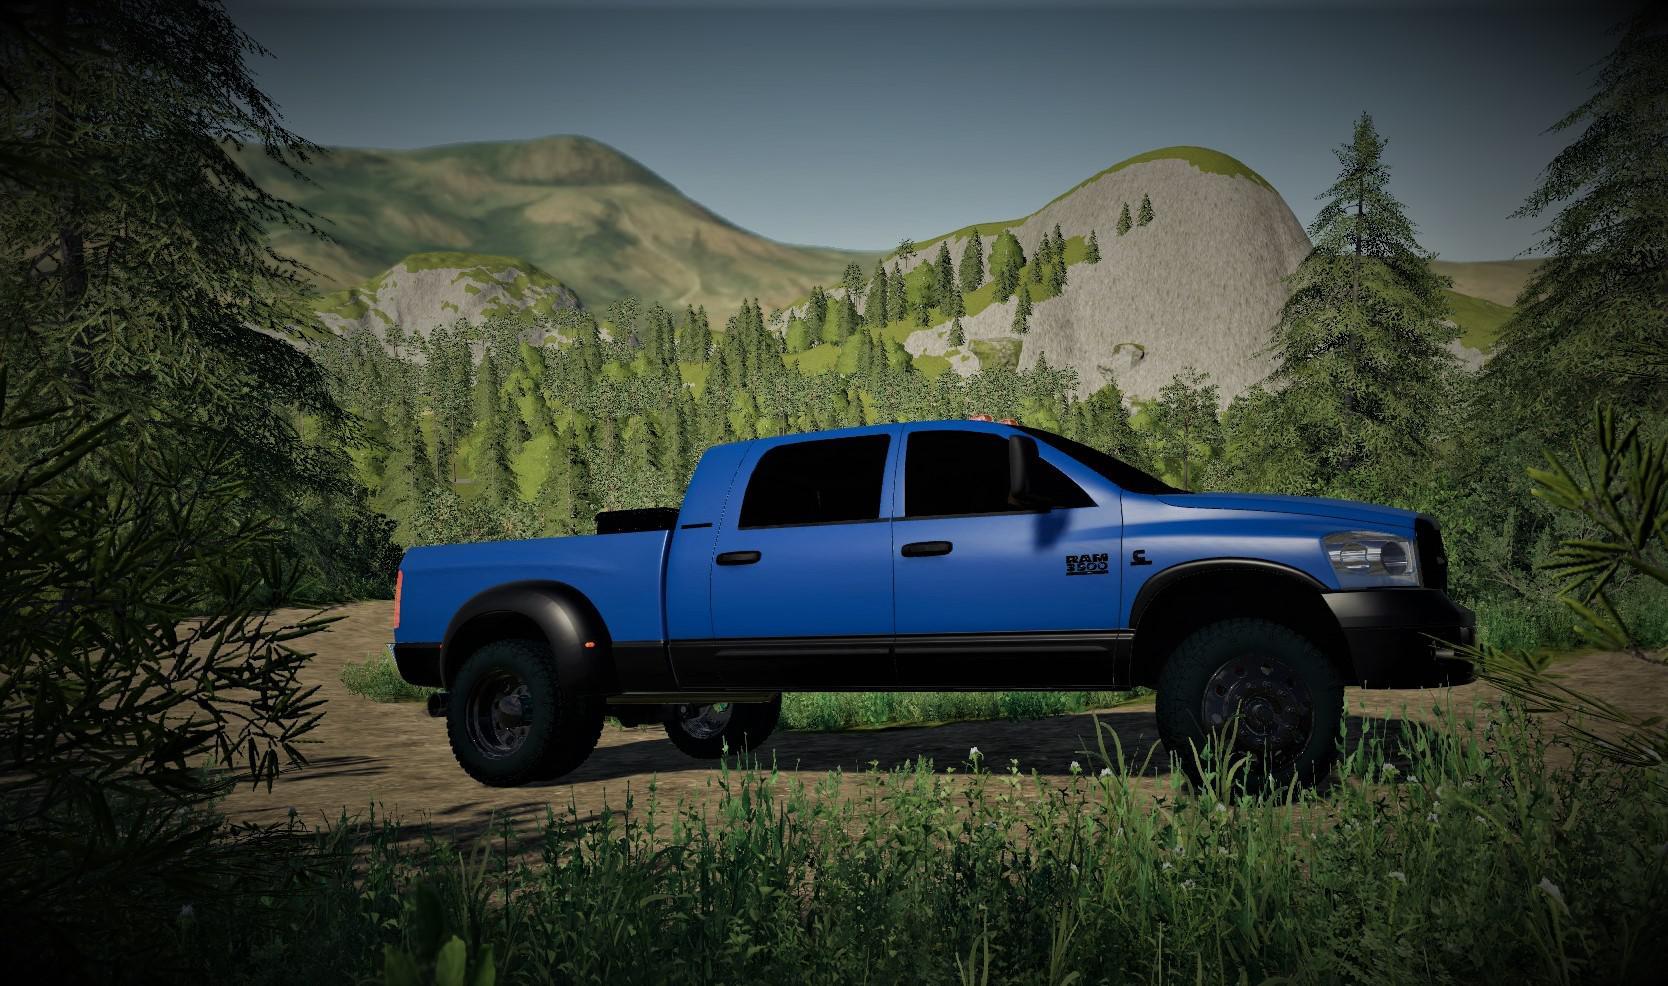 2007 Dodge 3500 Mega Cab V1 0 Fs19 Farming Simulator 19 Mod Fs19 Mod